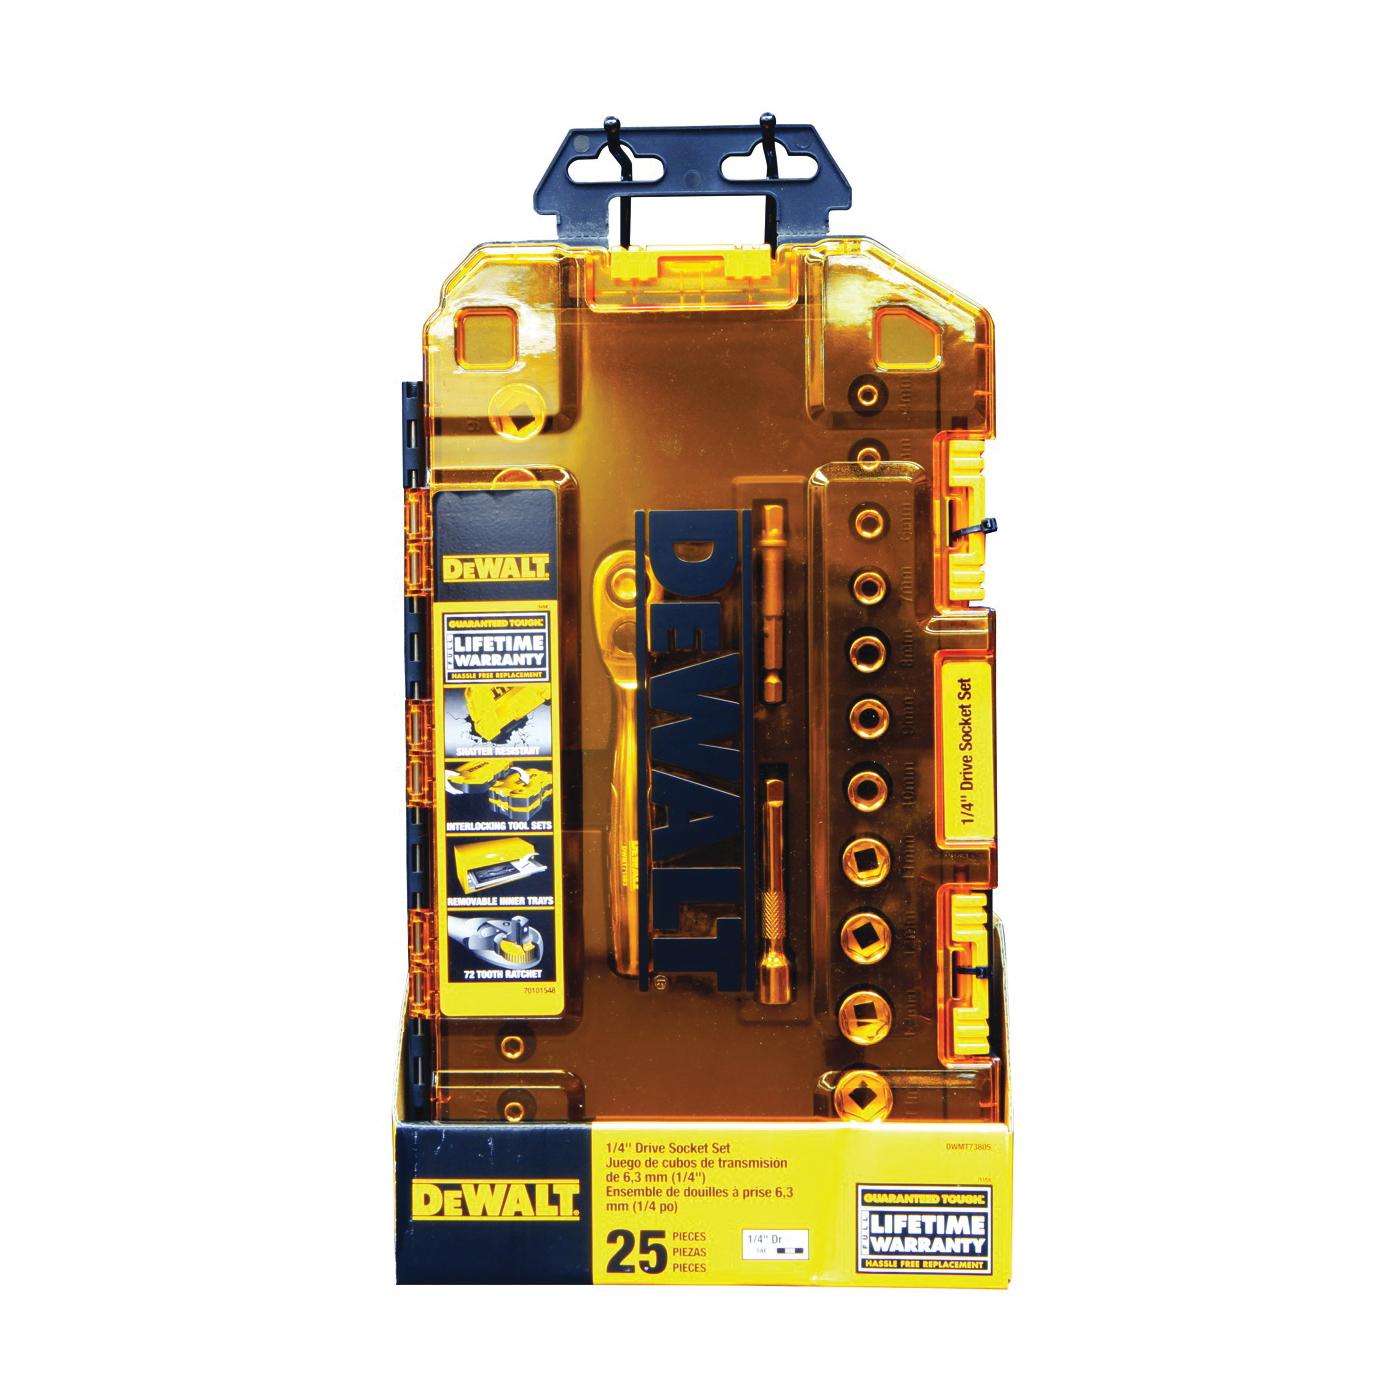 Picture of DeWALT DWMT73805 Socket Set, 25 -Piece, Chrome Vanadium, Polished Chrome Vanadium